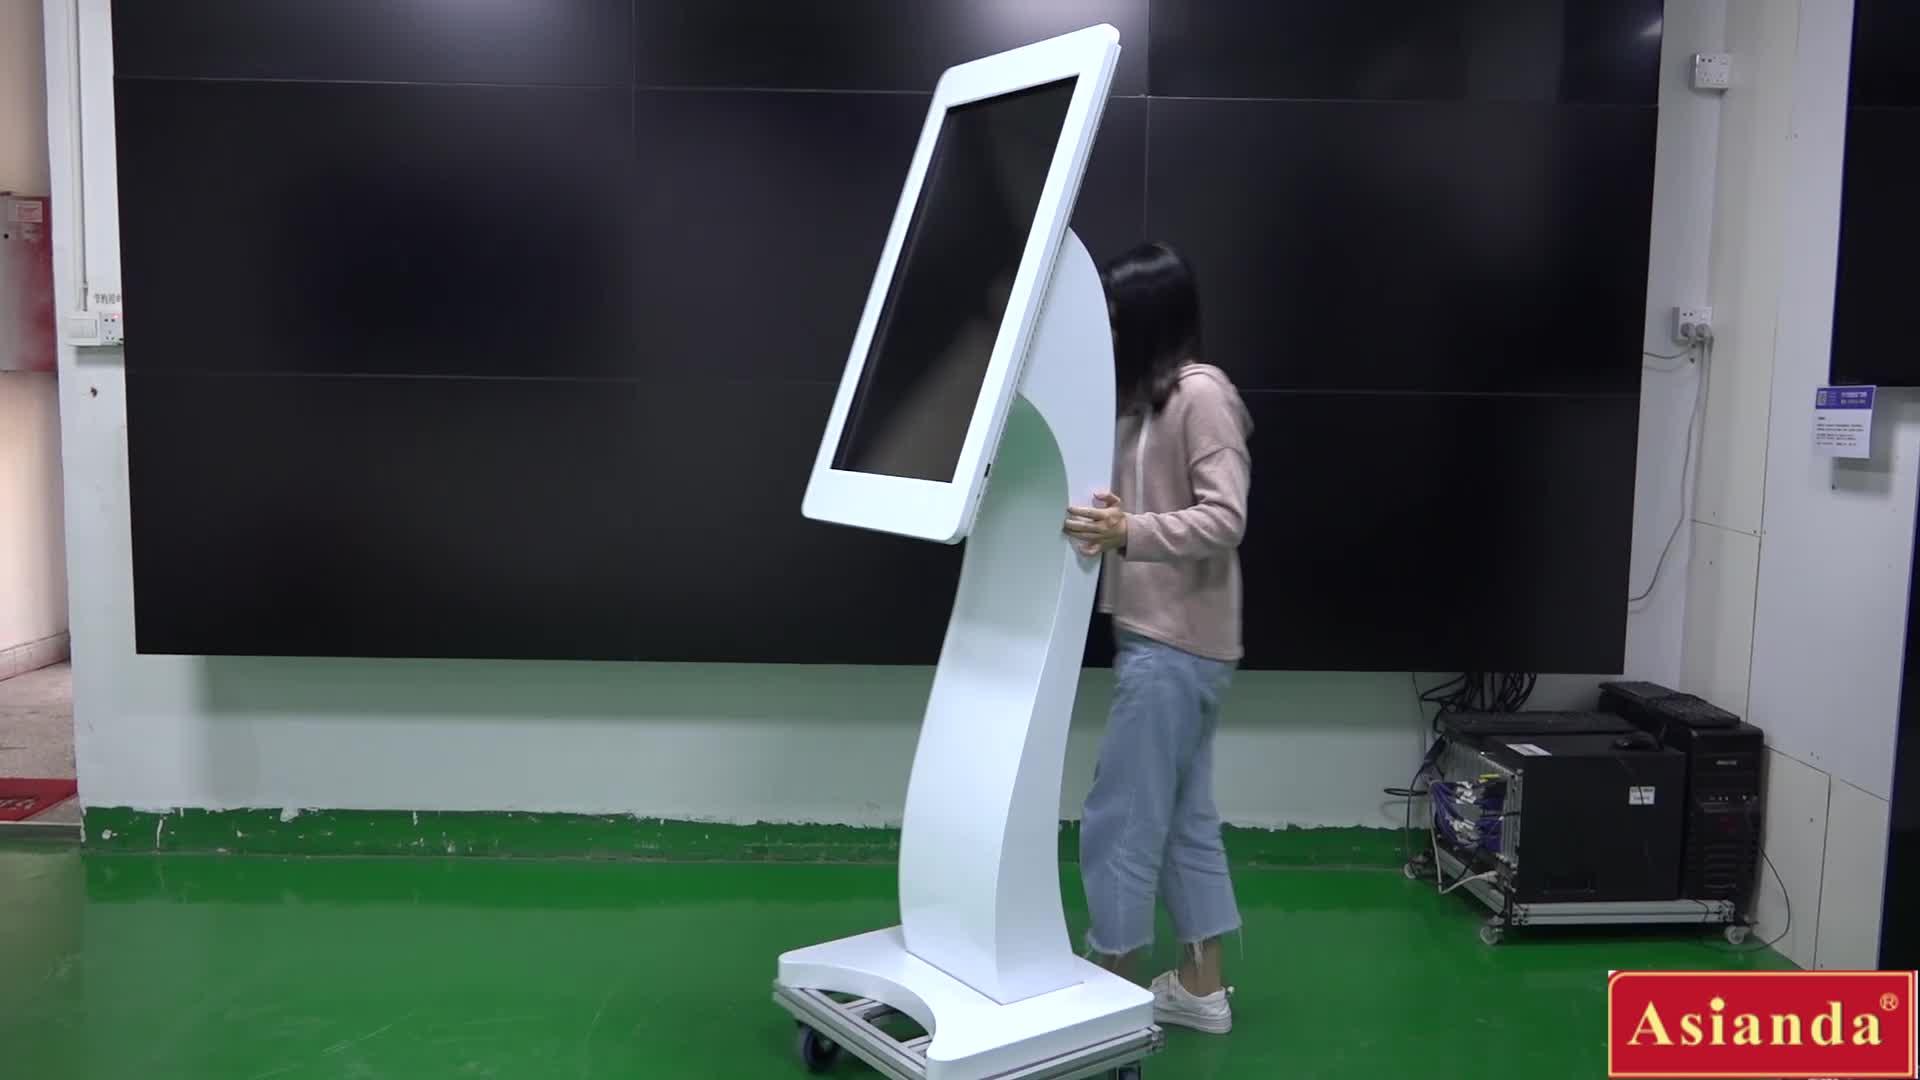 Aangepaste Full HD lcd 55 inch interactieve touch screen digital signage/digitale kiosk reclame display met gezichtsherkenning